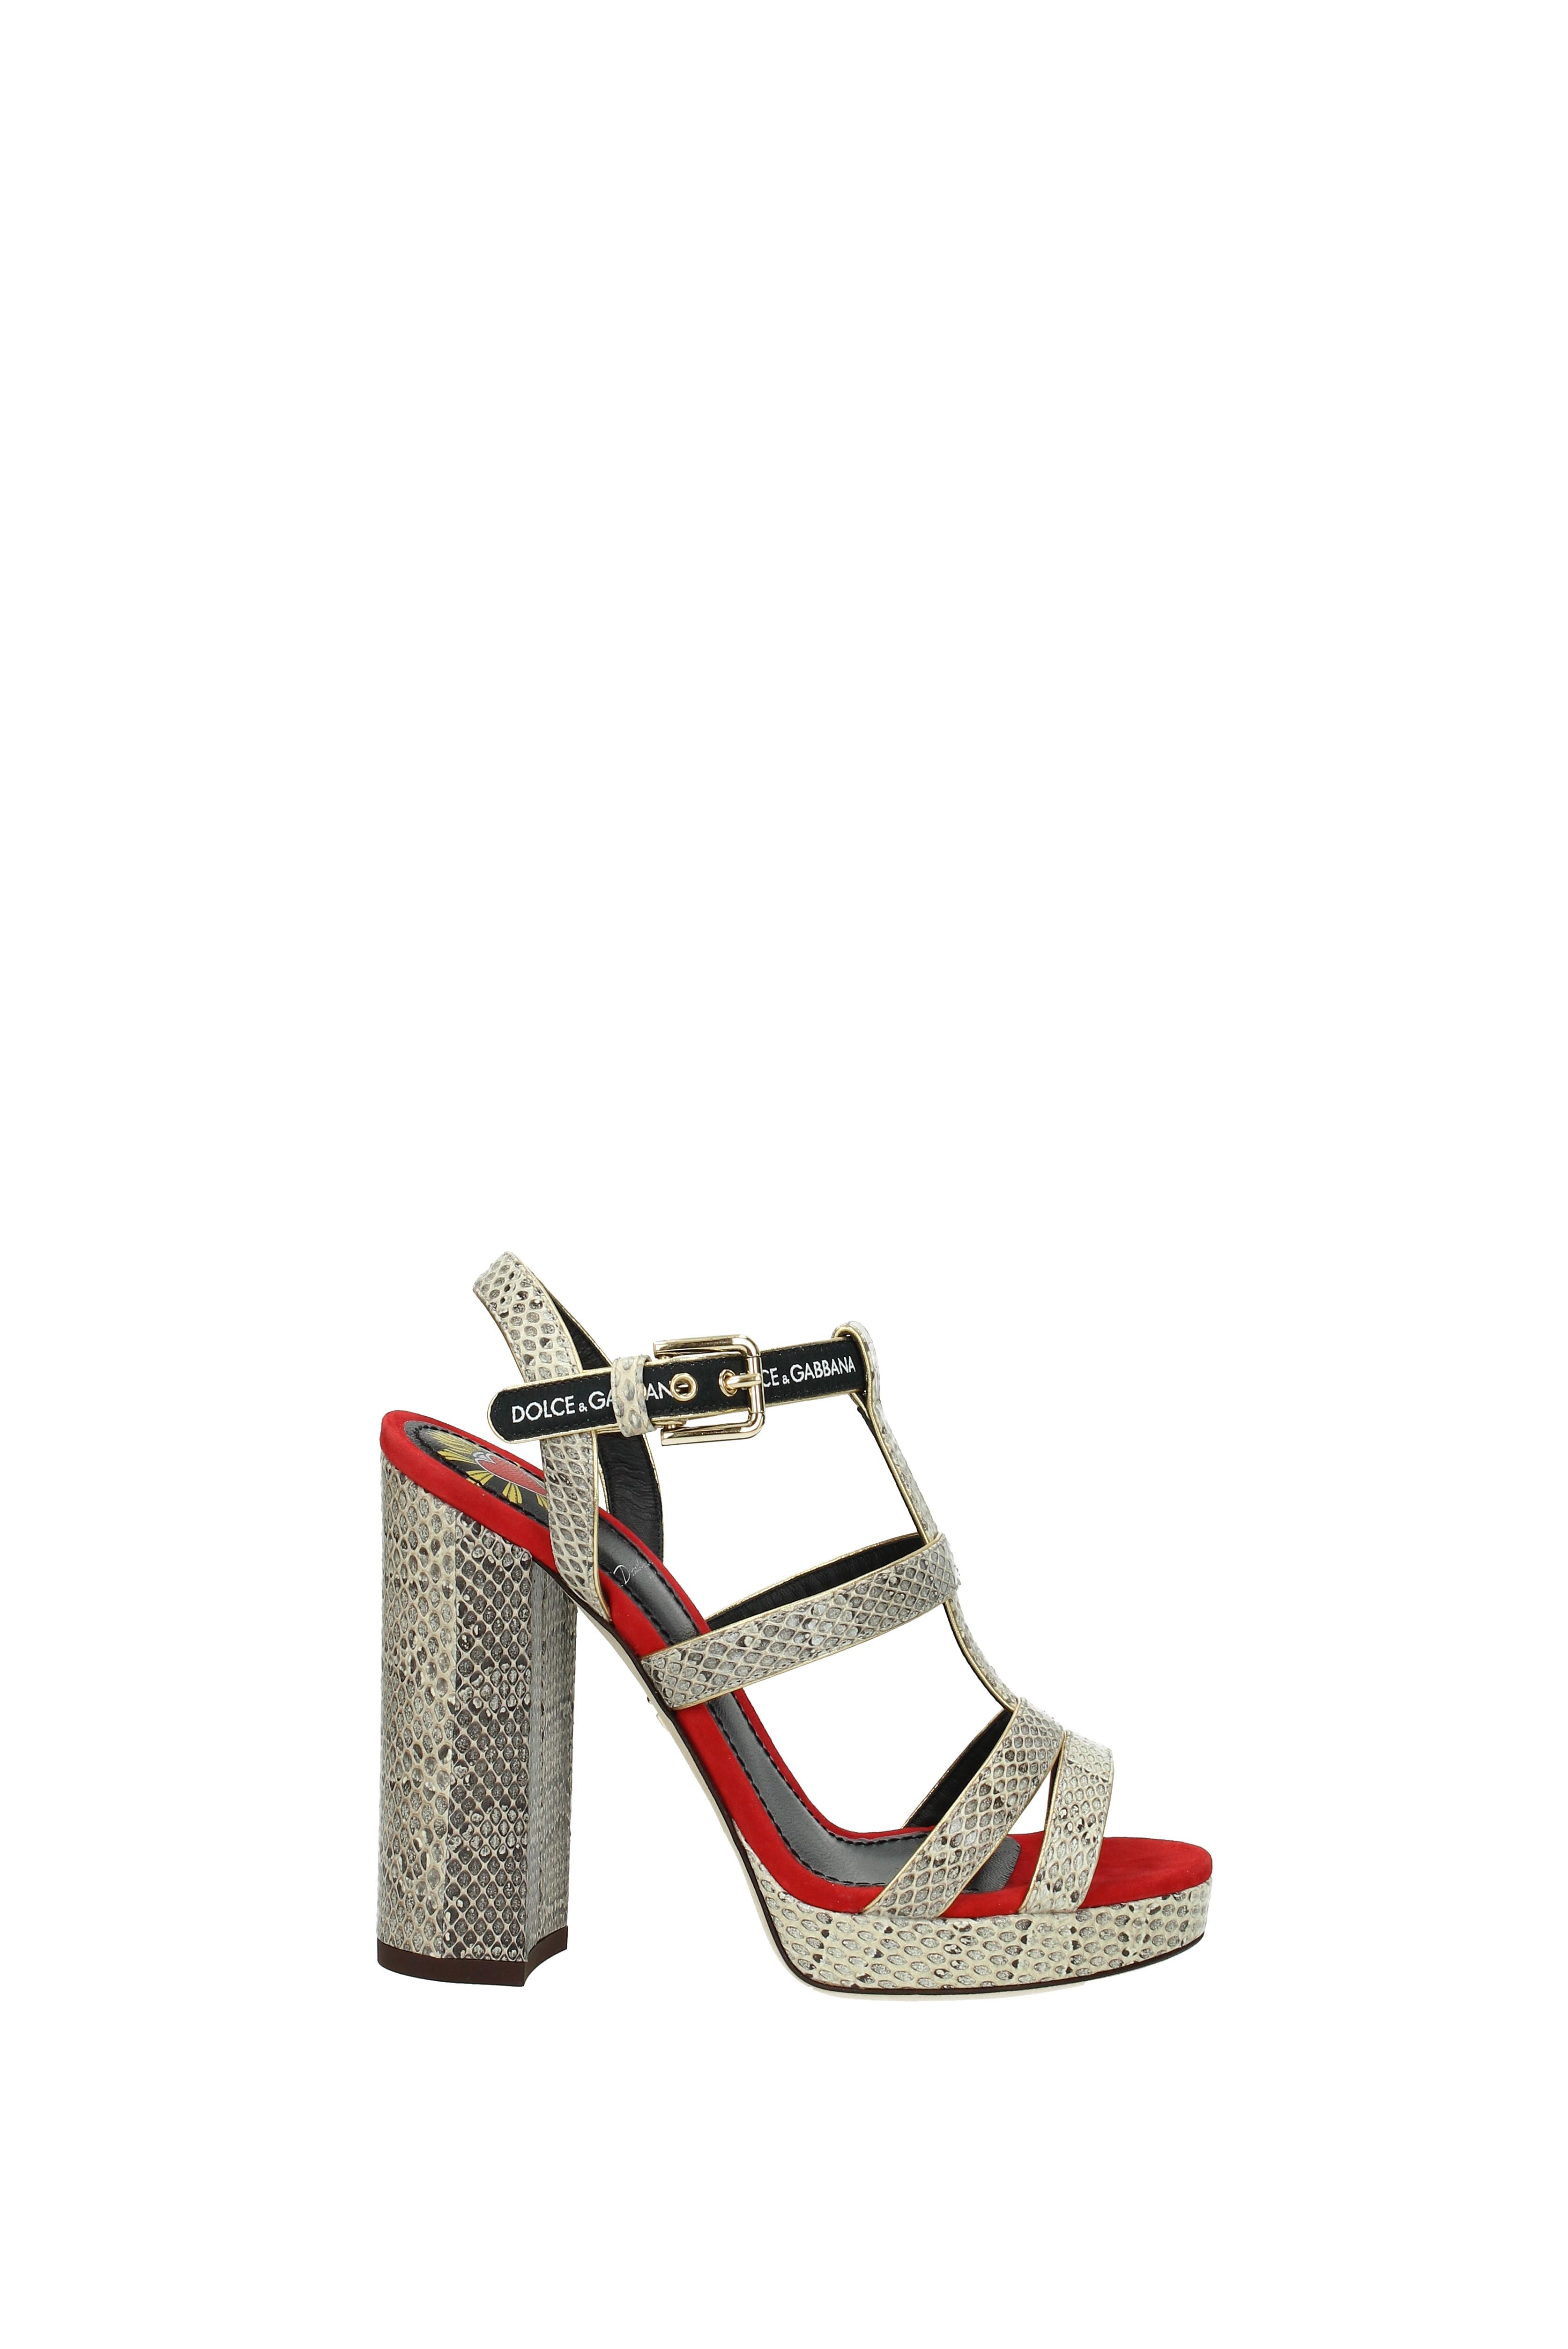 Sandalen Dolce&Gabbana Damen - Leder  Schlange (CR0562AN783) (CR0562AN783) Schlange 76001c